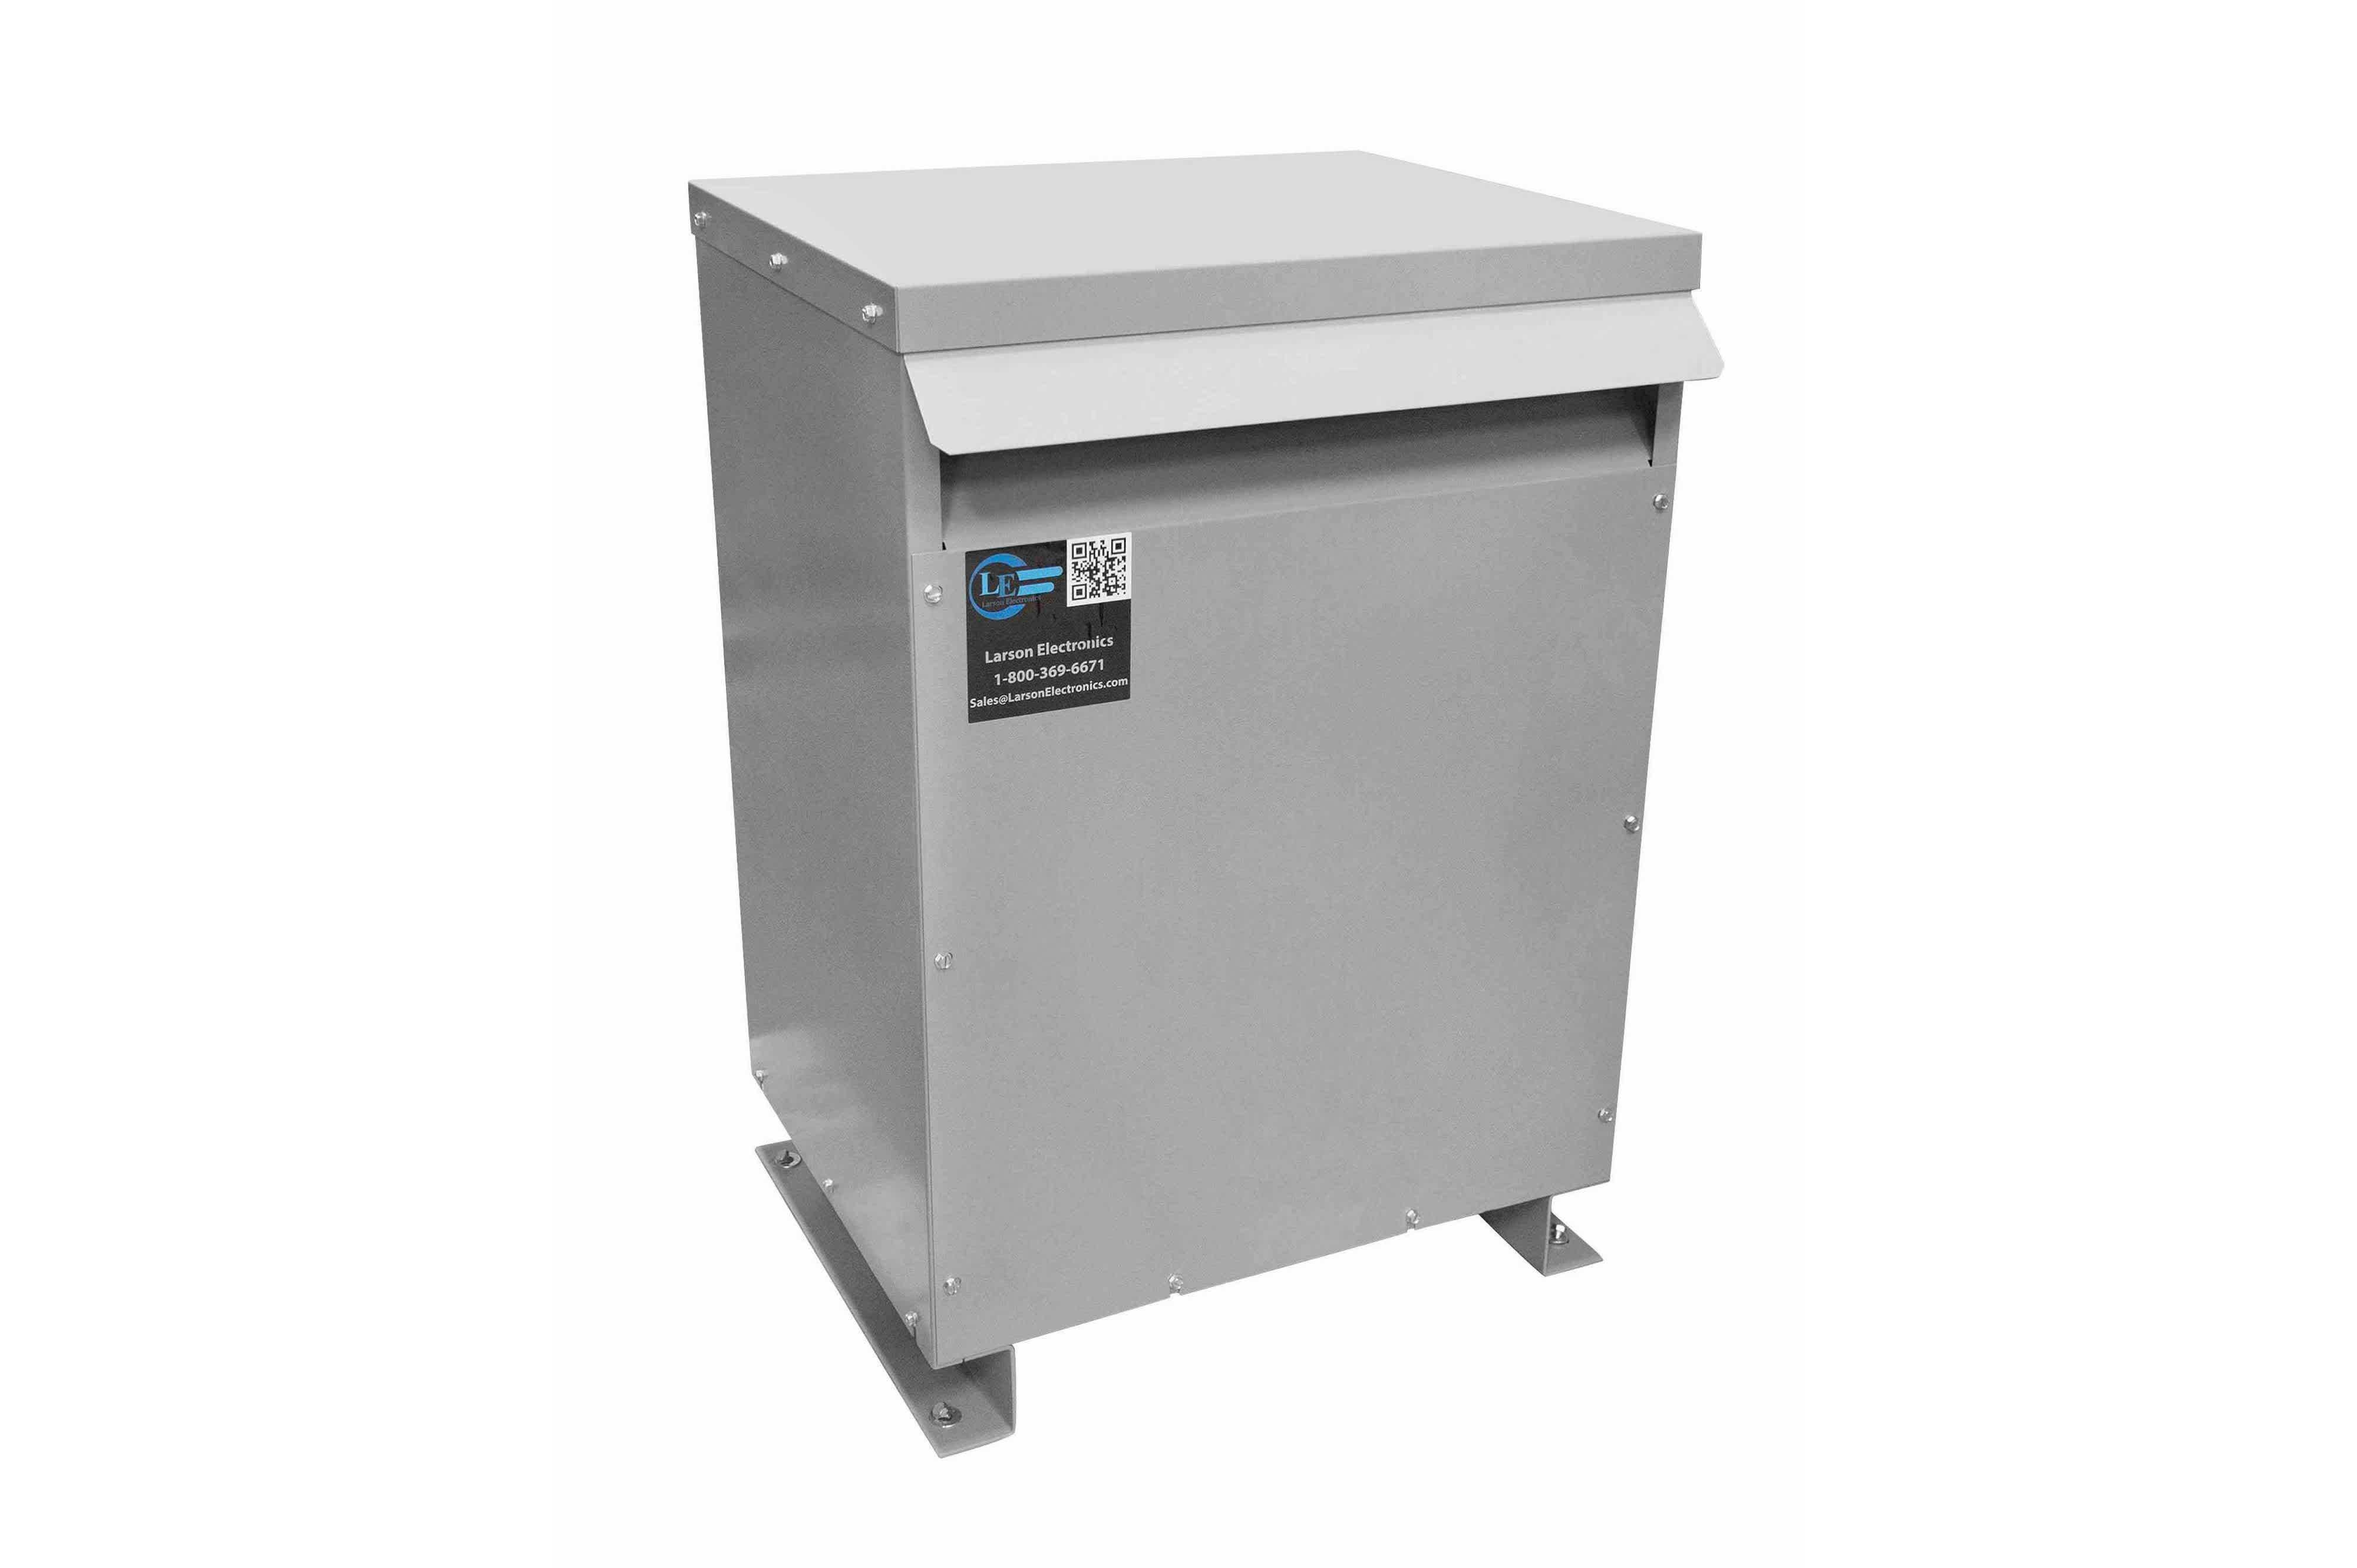 137.5 kVA 3PH Isolation Transformer, 208V Wye Primary, 415V Delta Secondary, N3R, Ventilated, 60 Hz